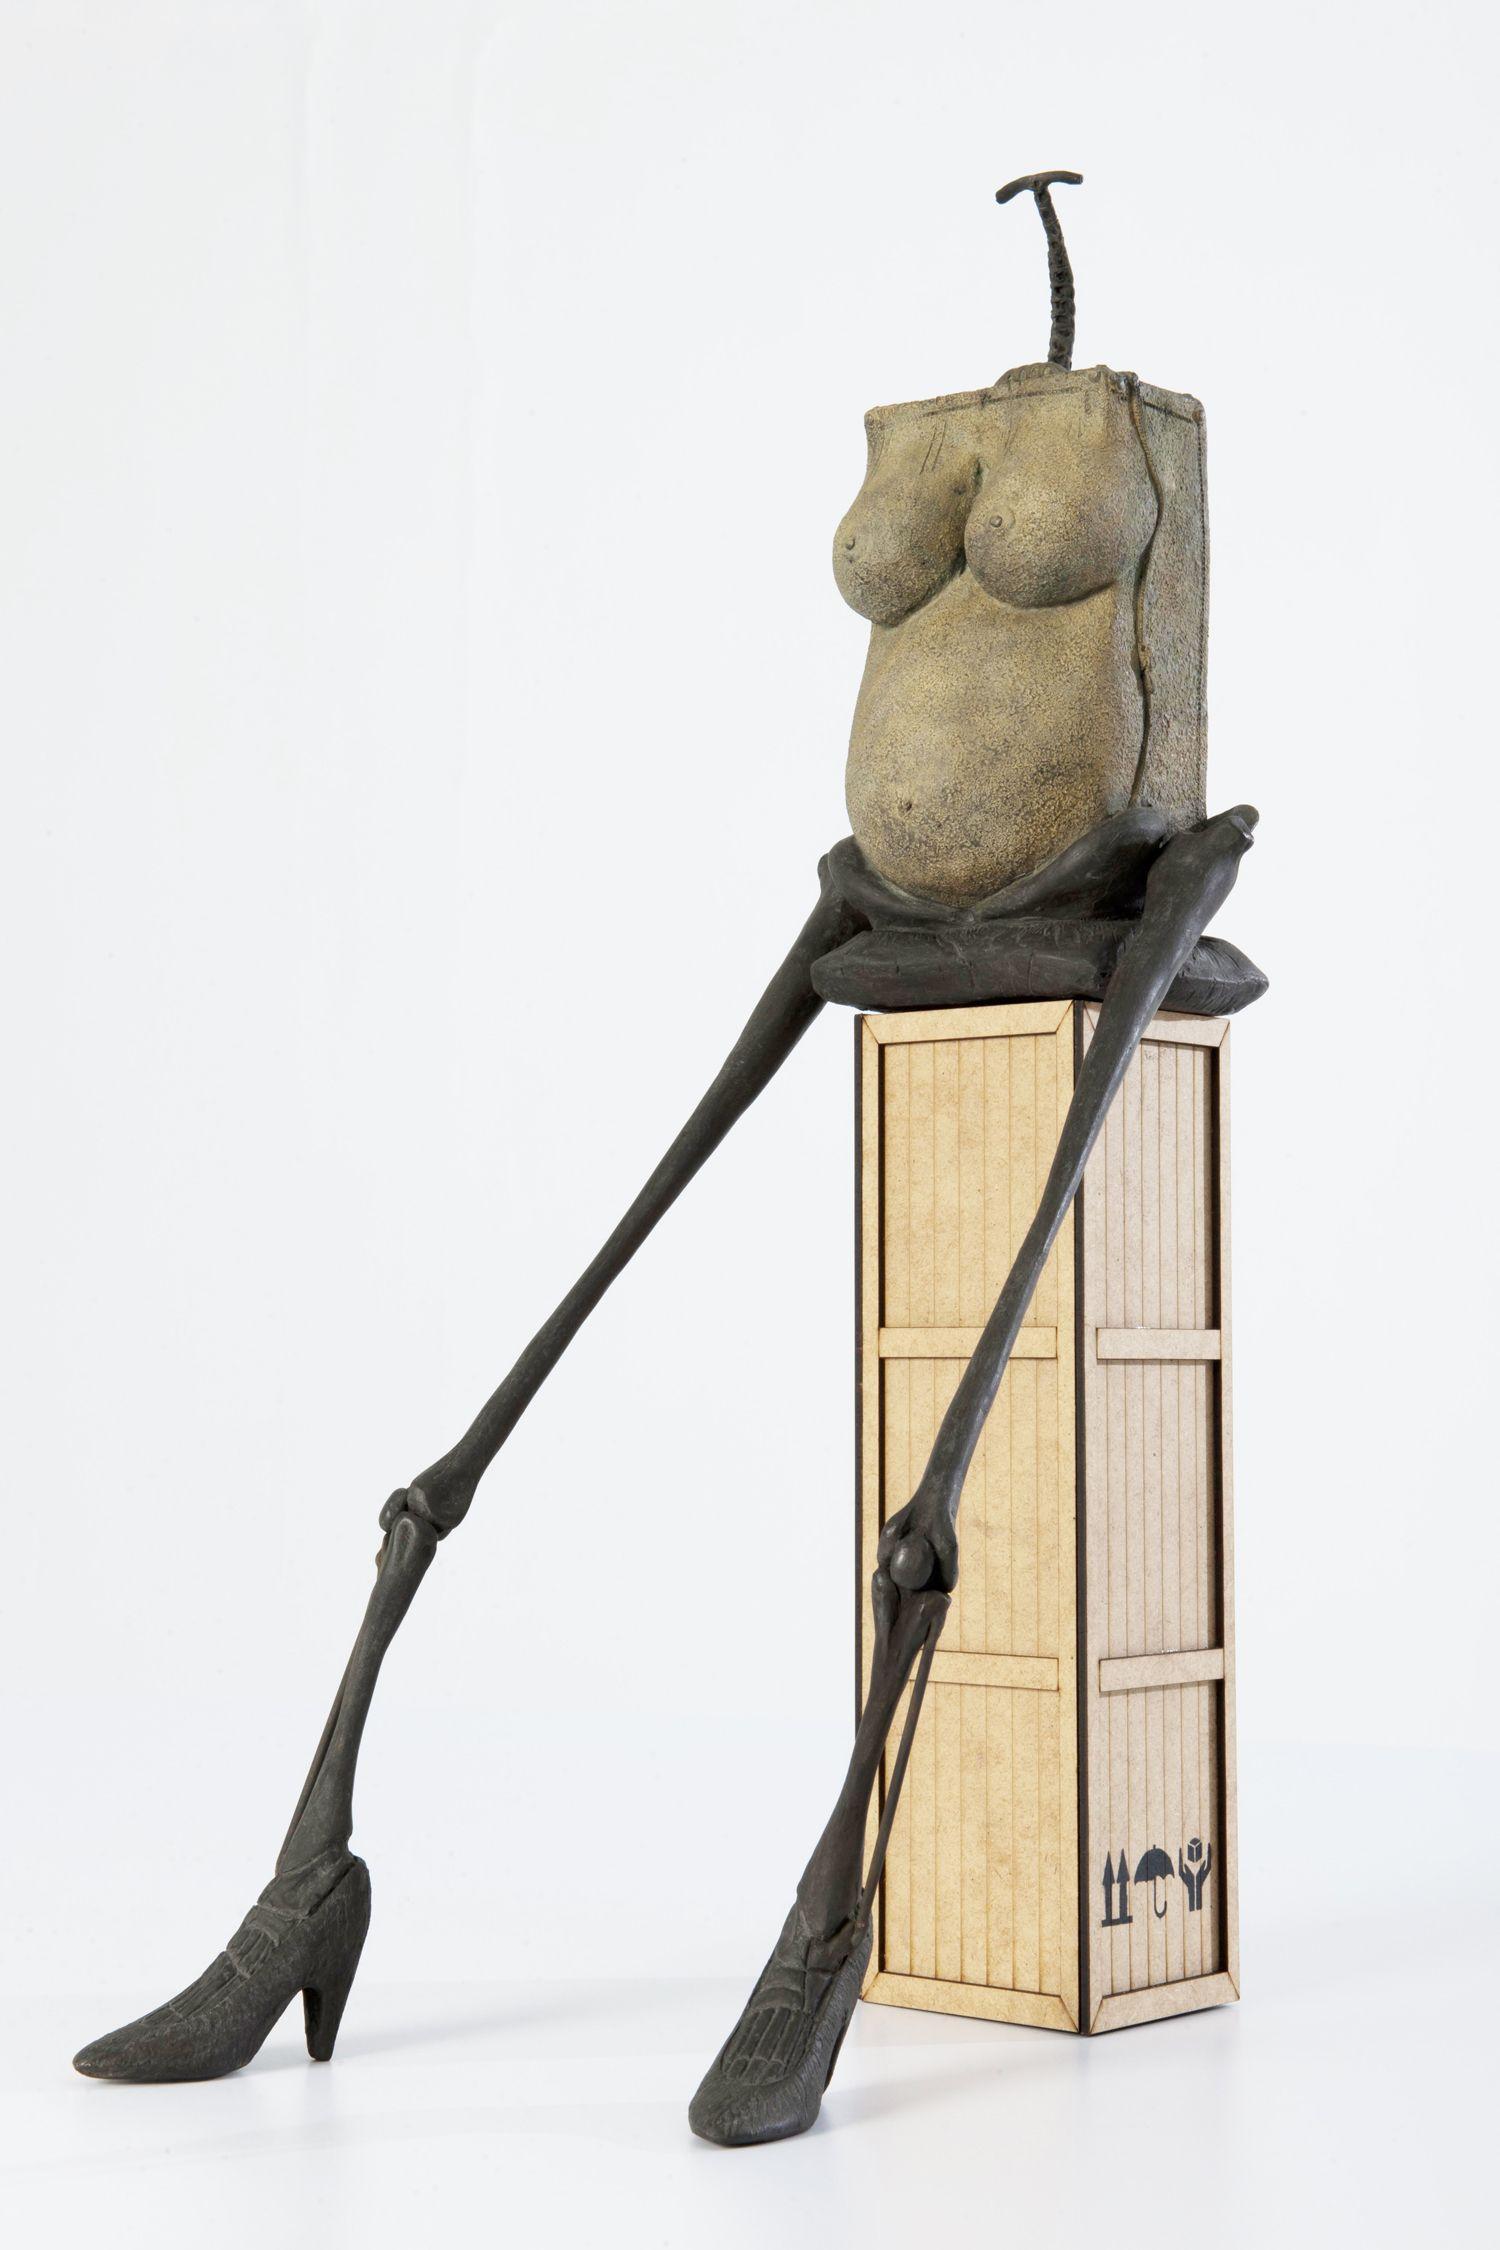 Bipeds By Francisco Pereira